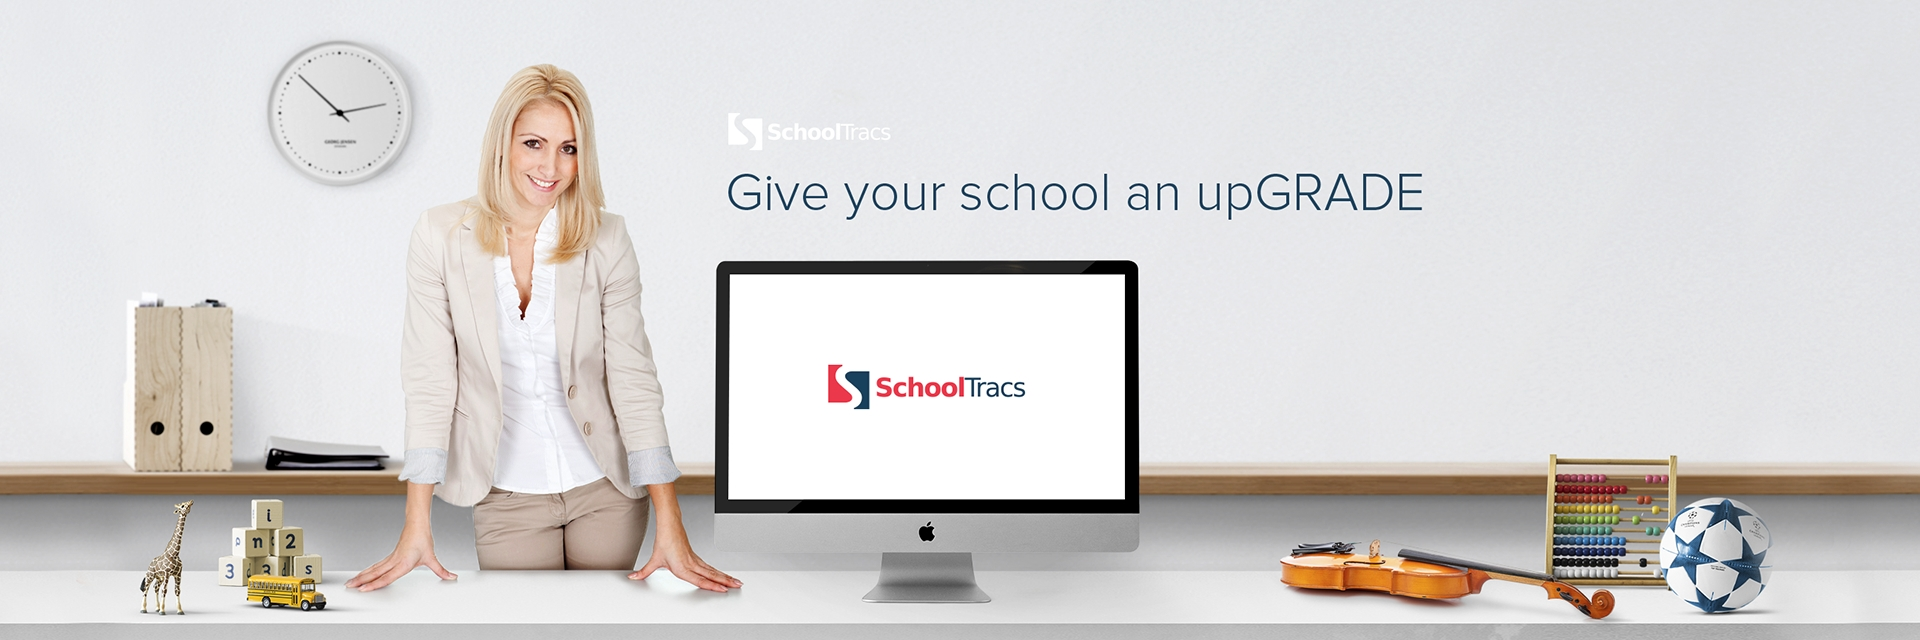 https://media.authentic-studio.com/web-content/uploads/2020/11/brand-identity-for-school-management-system.jpg